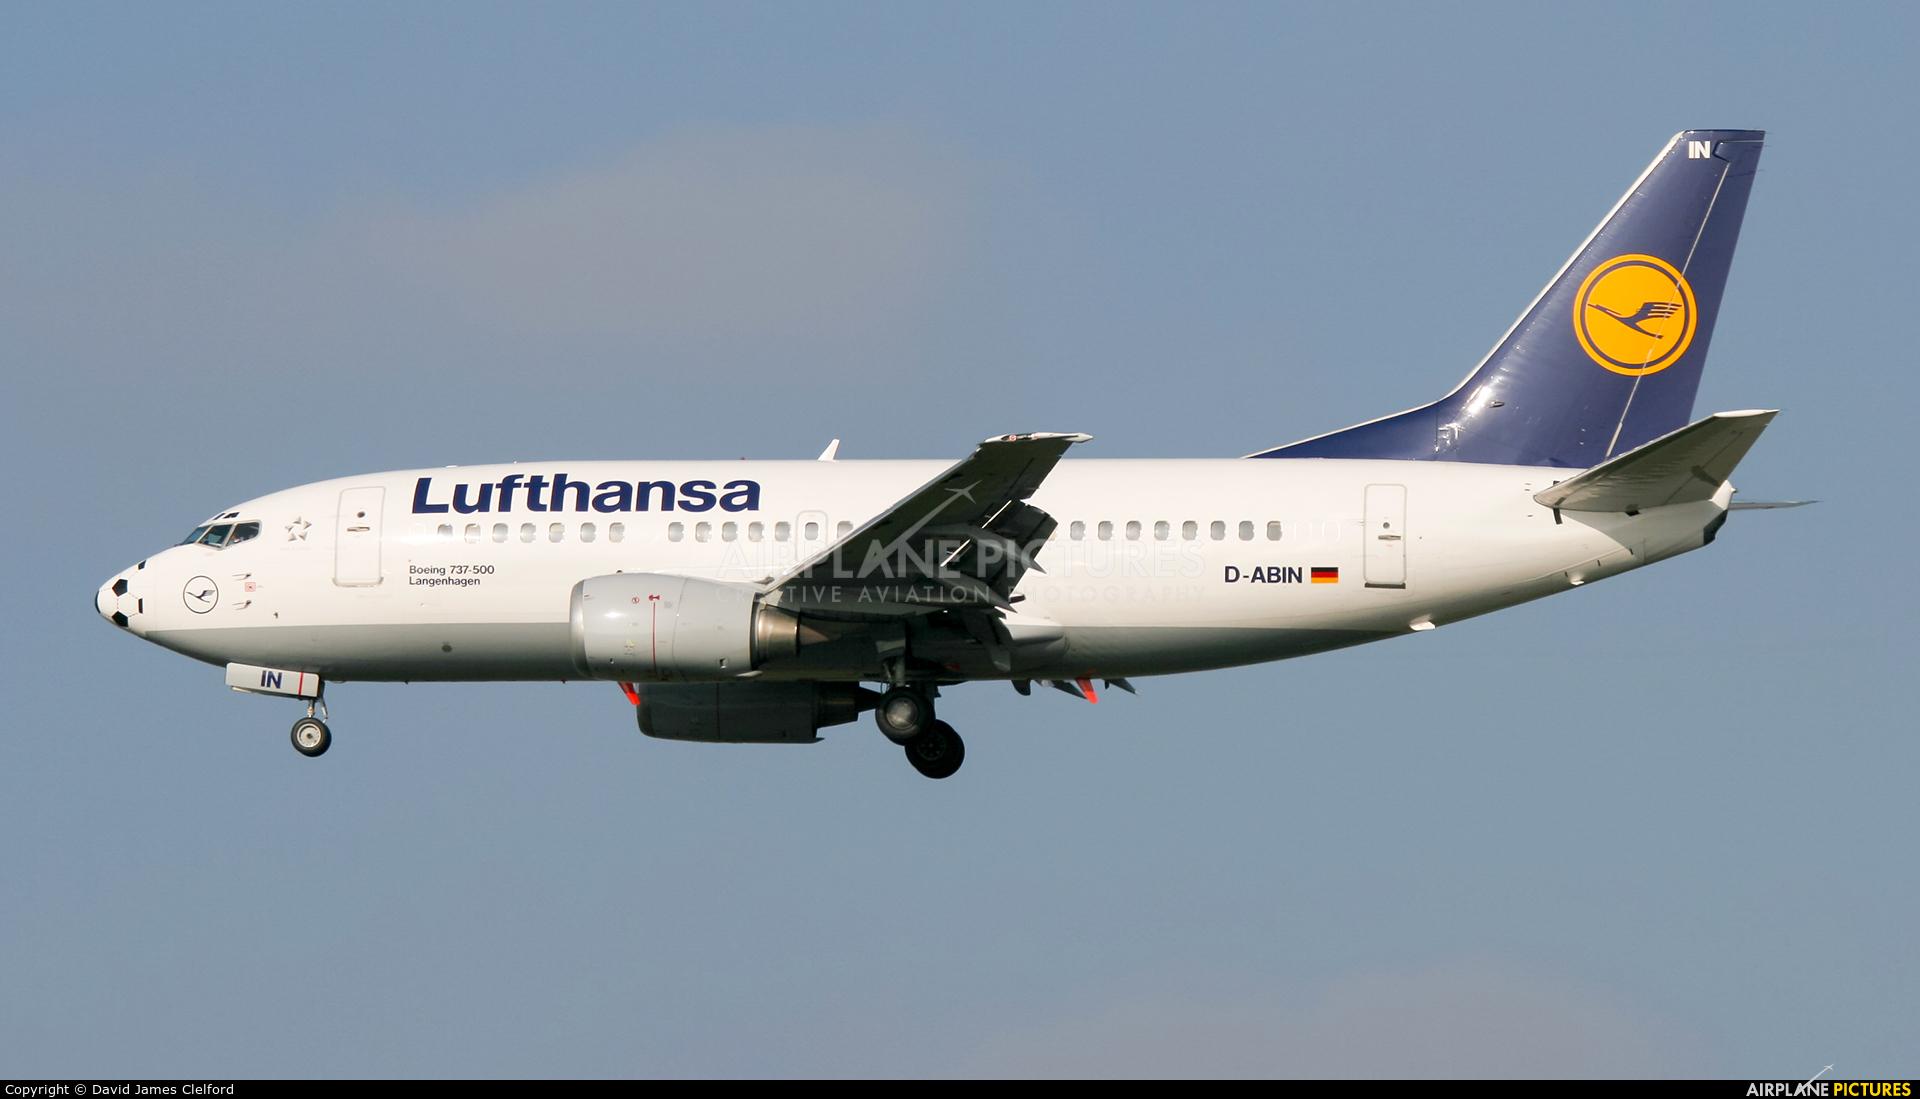 Lufthansa D-ABIN aircraft at Frankfurt